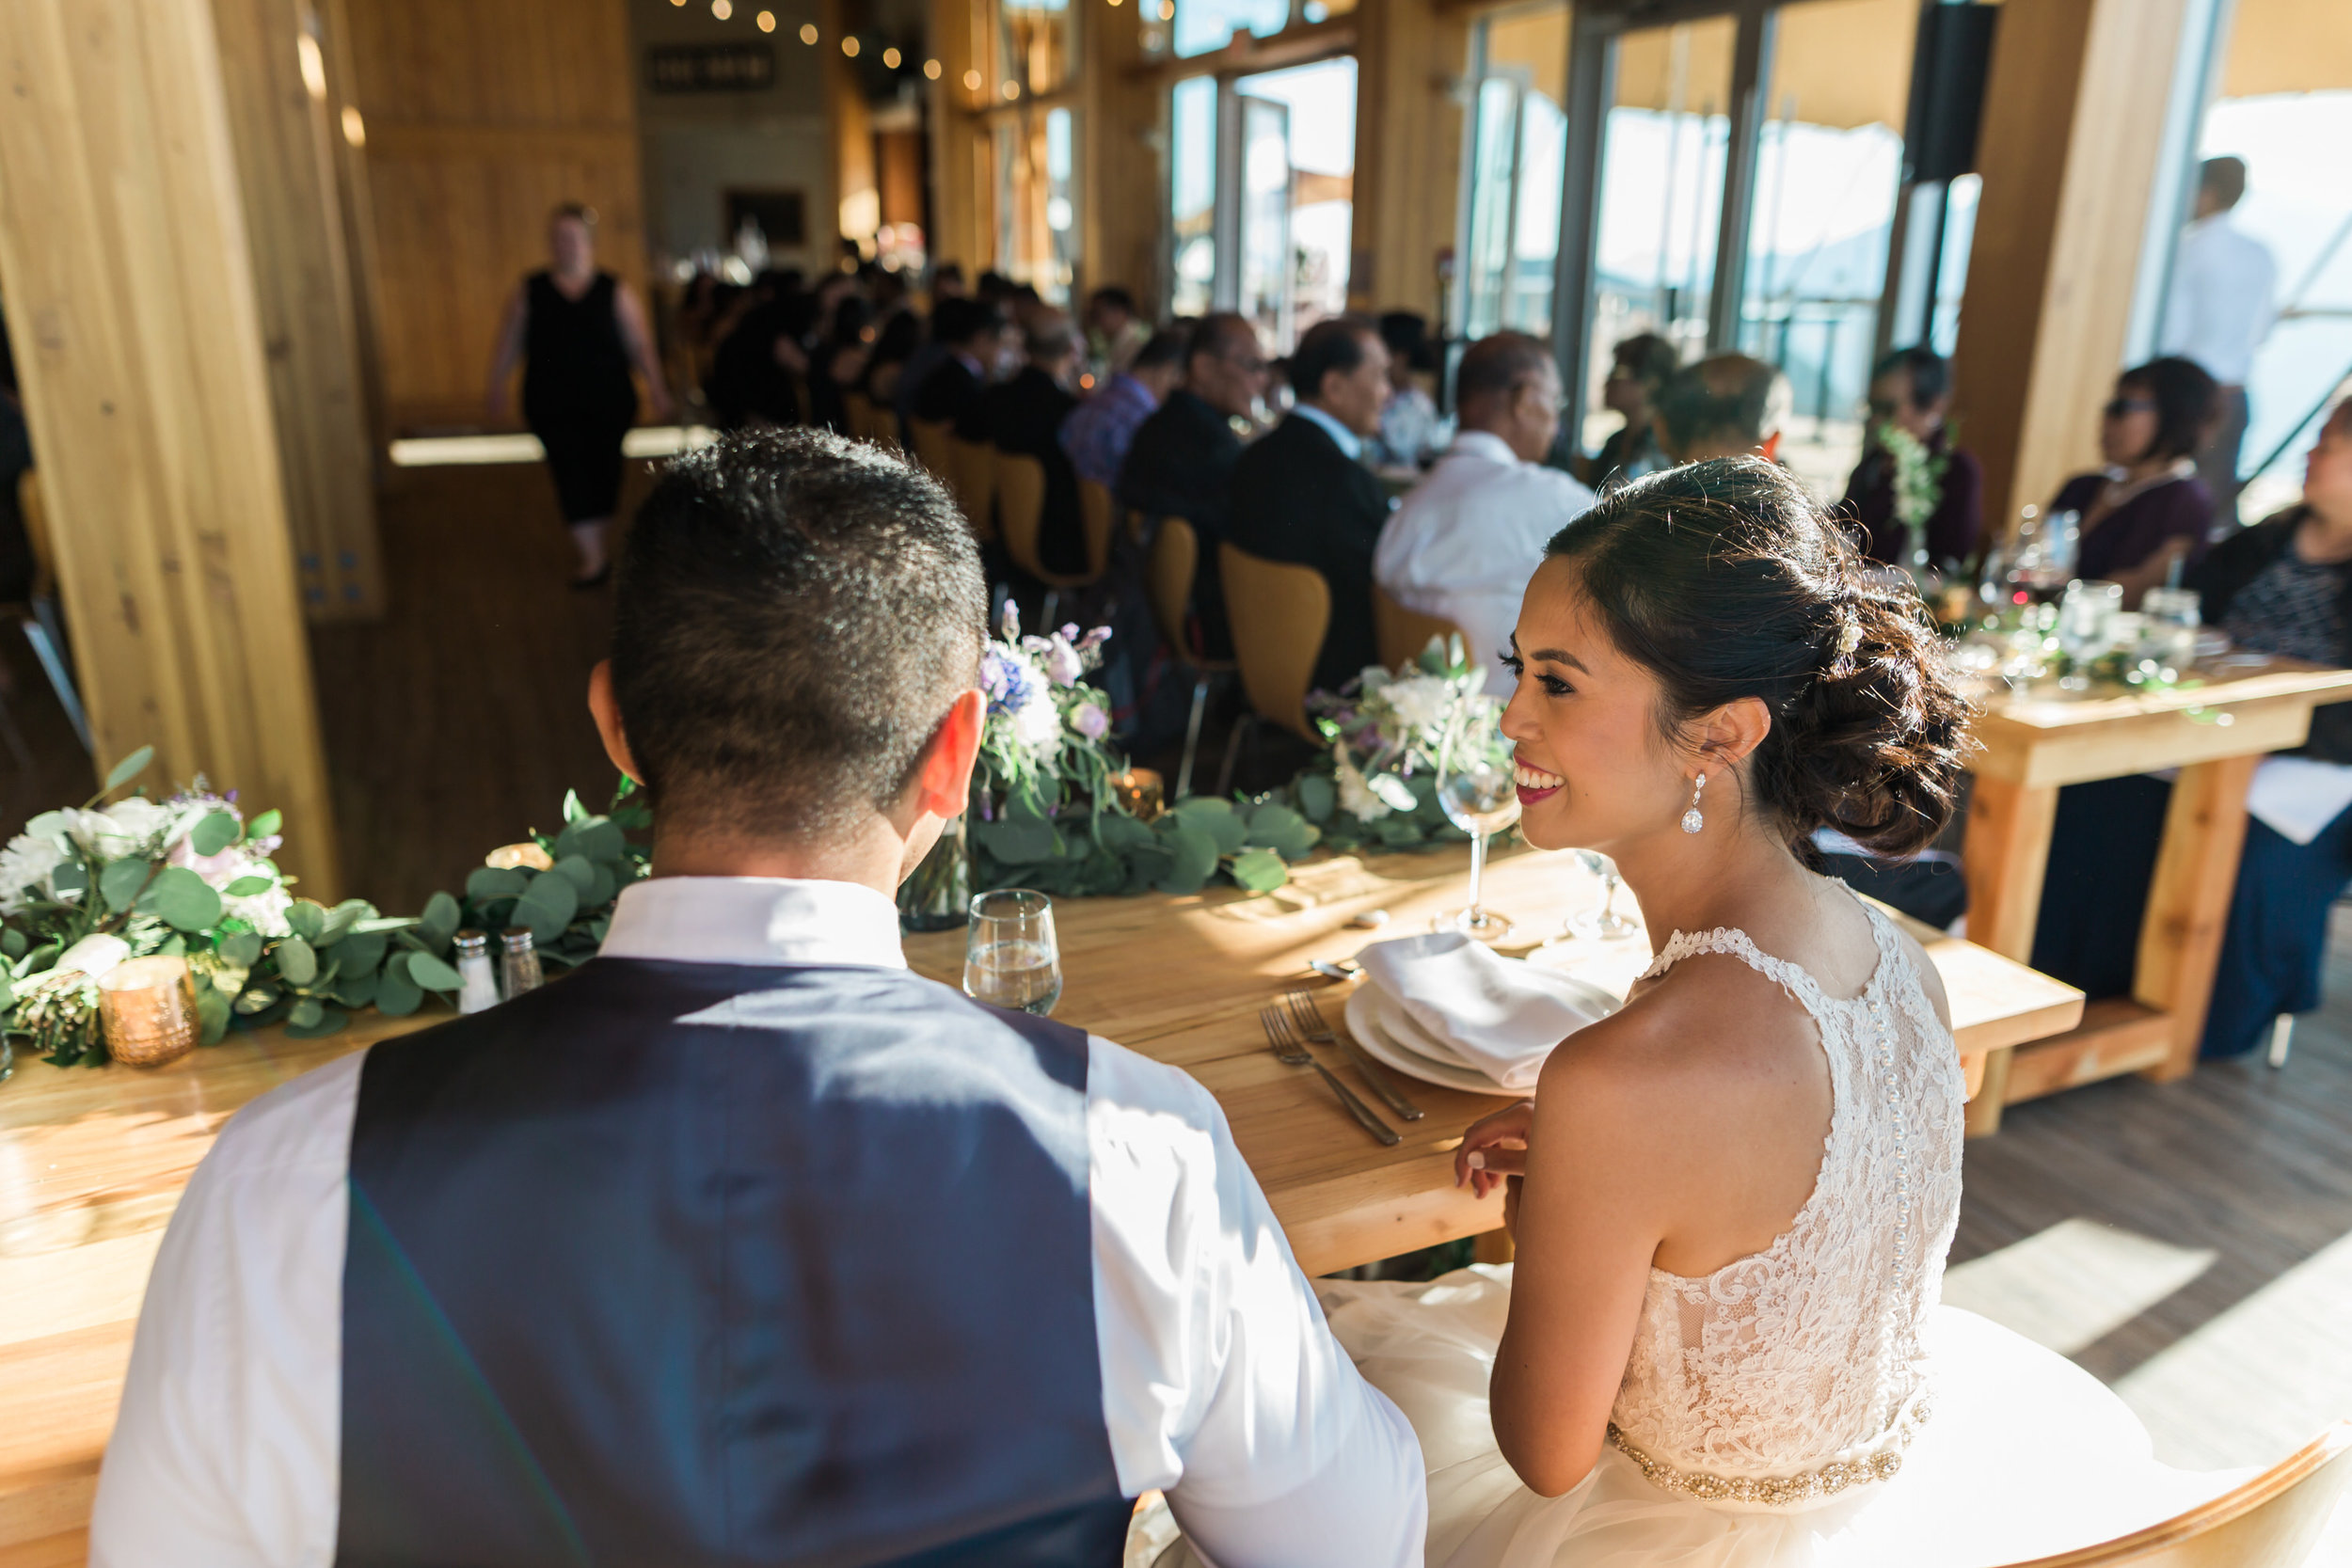 Squamish Wedding Photographer - Sea to Sky Gondola Wedding Photos -  Vancouver Wedding Photographer & Videographer - Sunshine Coast Wedding Photos - Sunshine Coast Wedding Photographer - Jennifer Picard Photography - IMG_4410.jpg